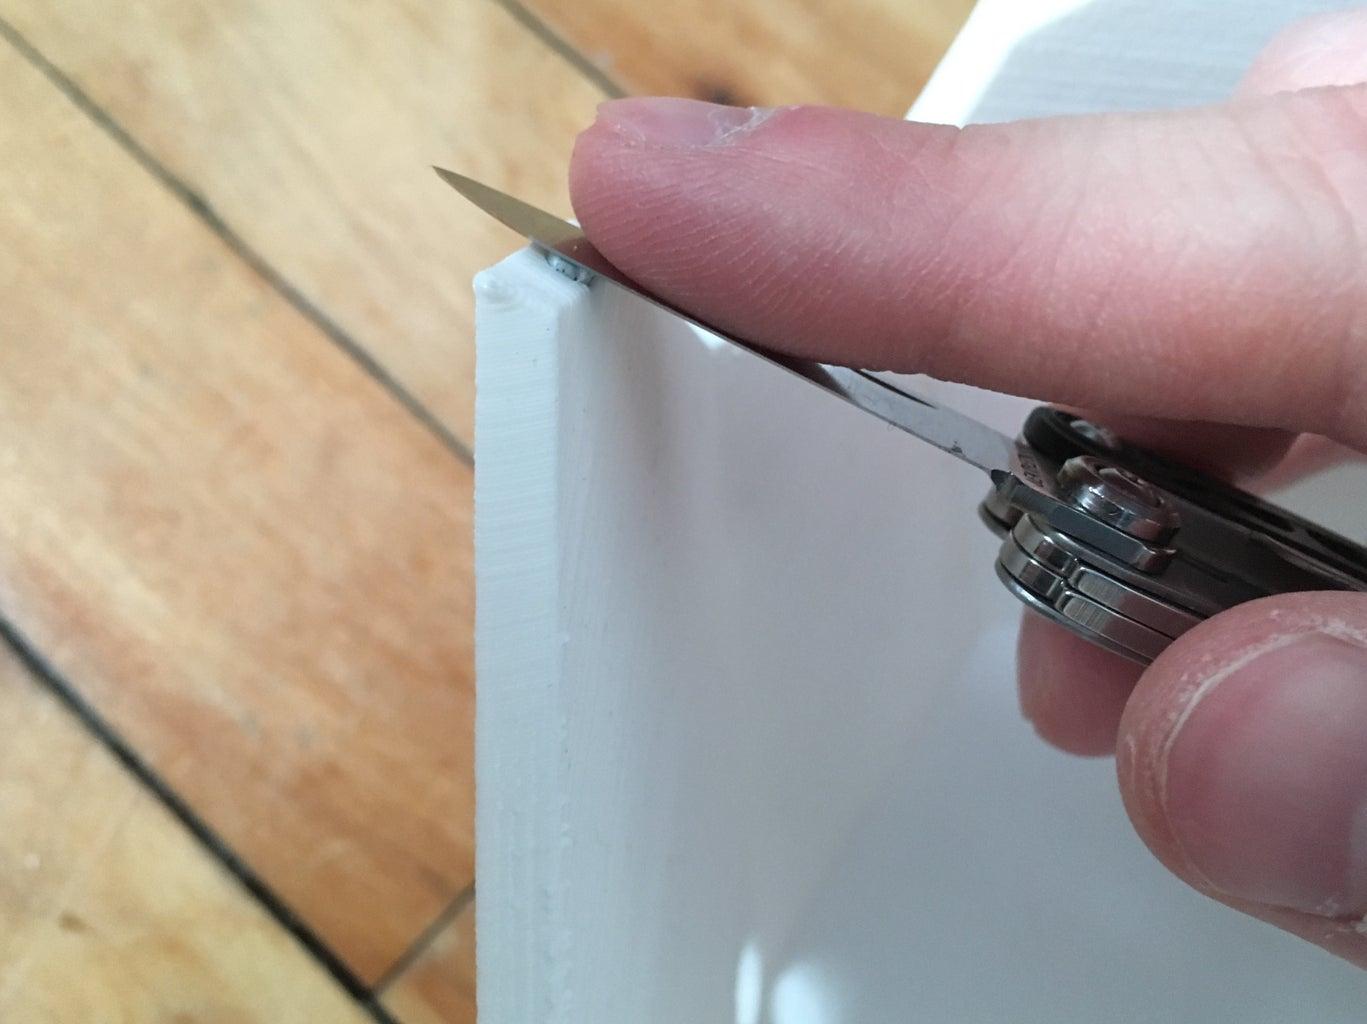 Sanding & Adding the Magnets